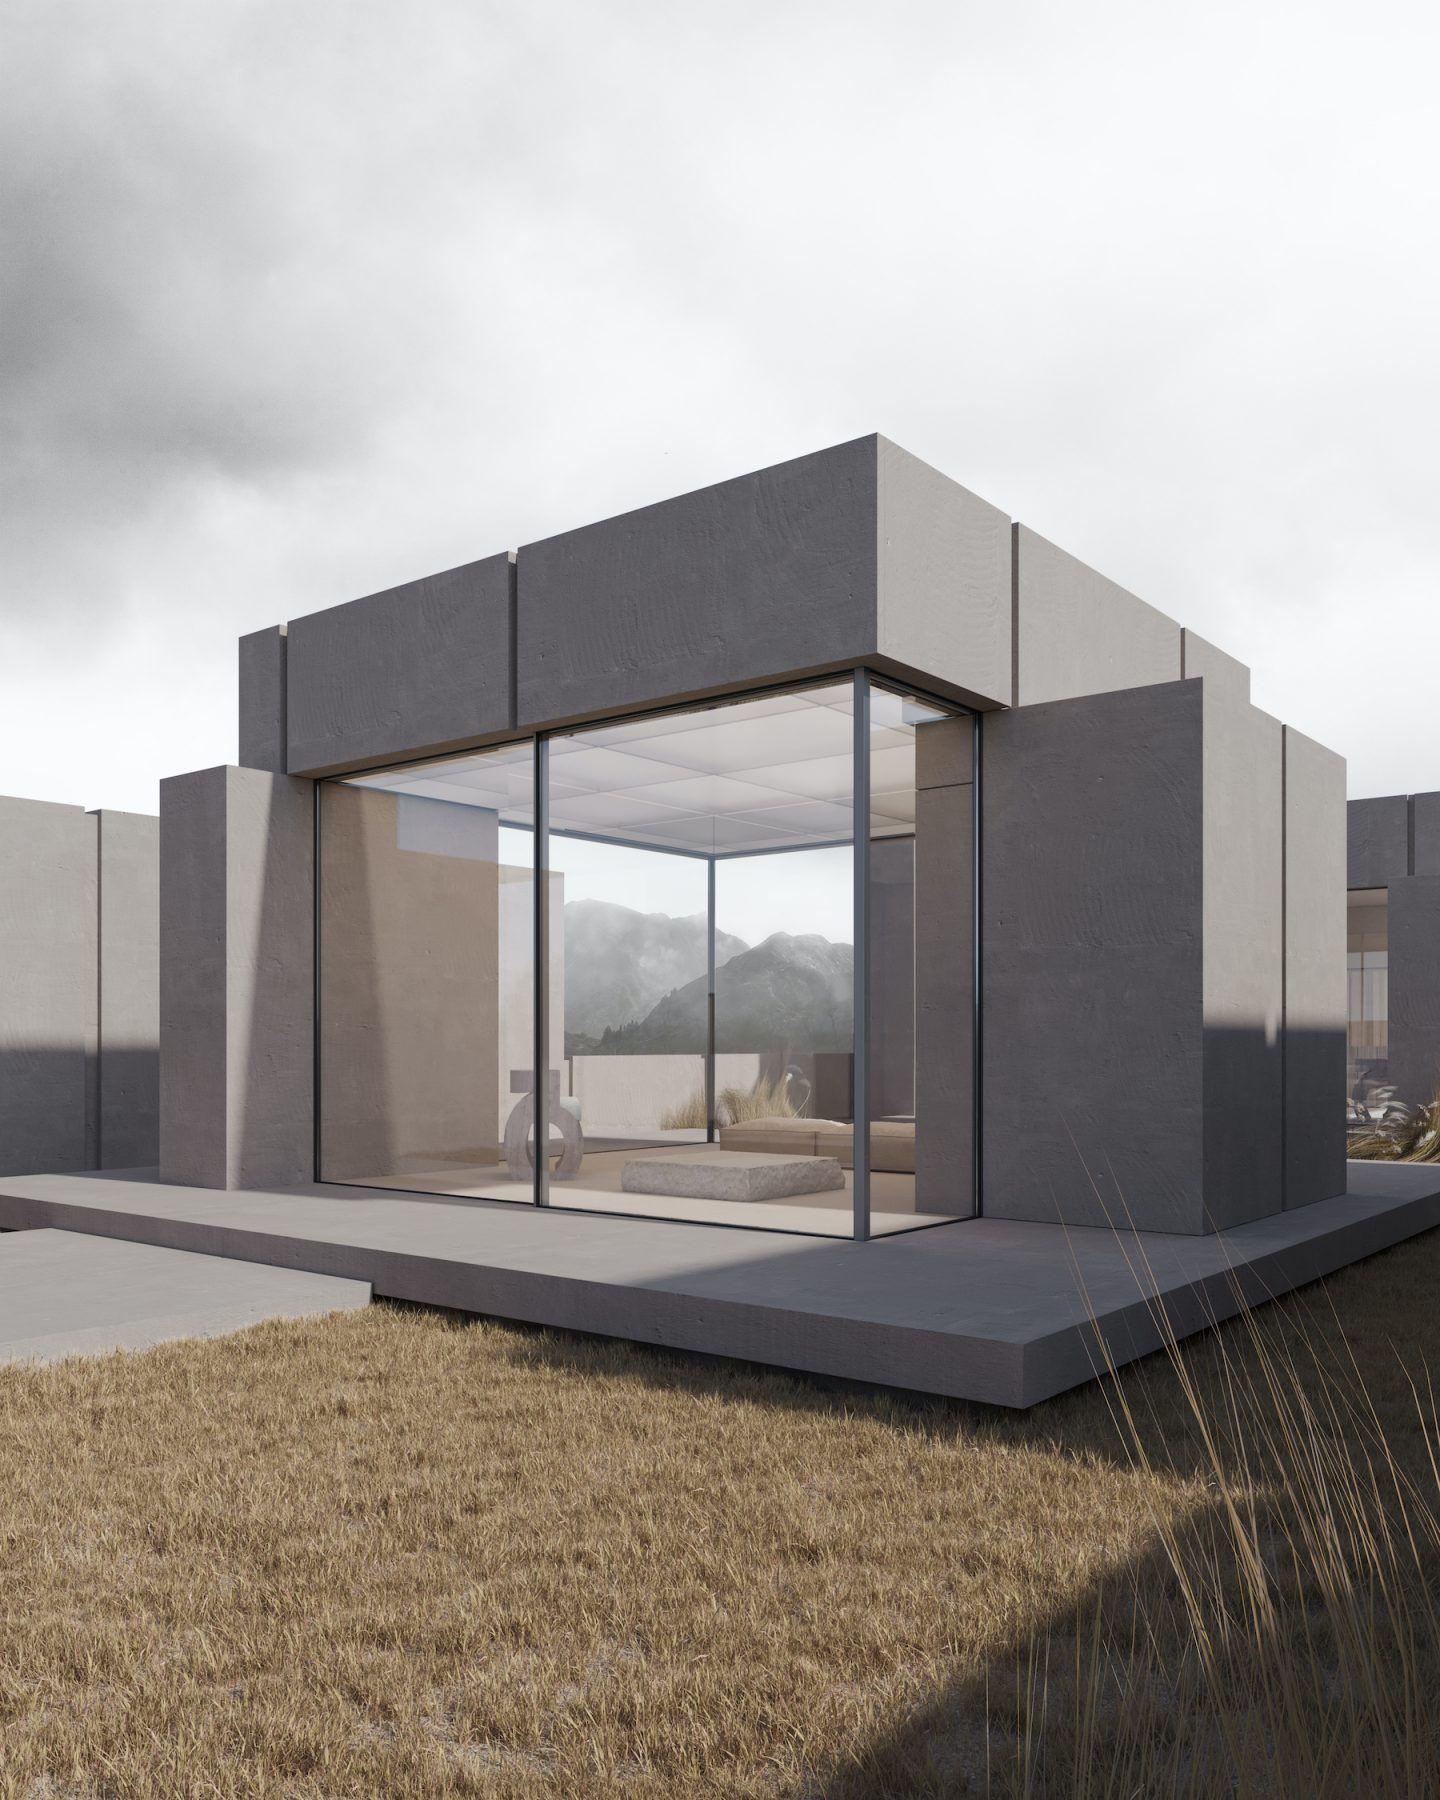 IGNANT-Design-Kanstantsin-Remez-II-Introvert-Residence-03